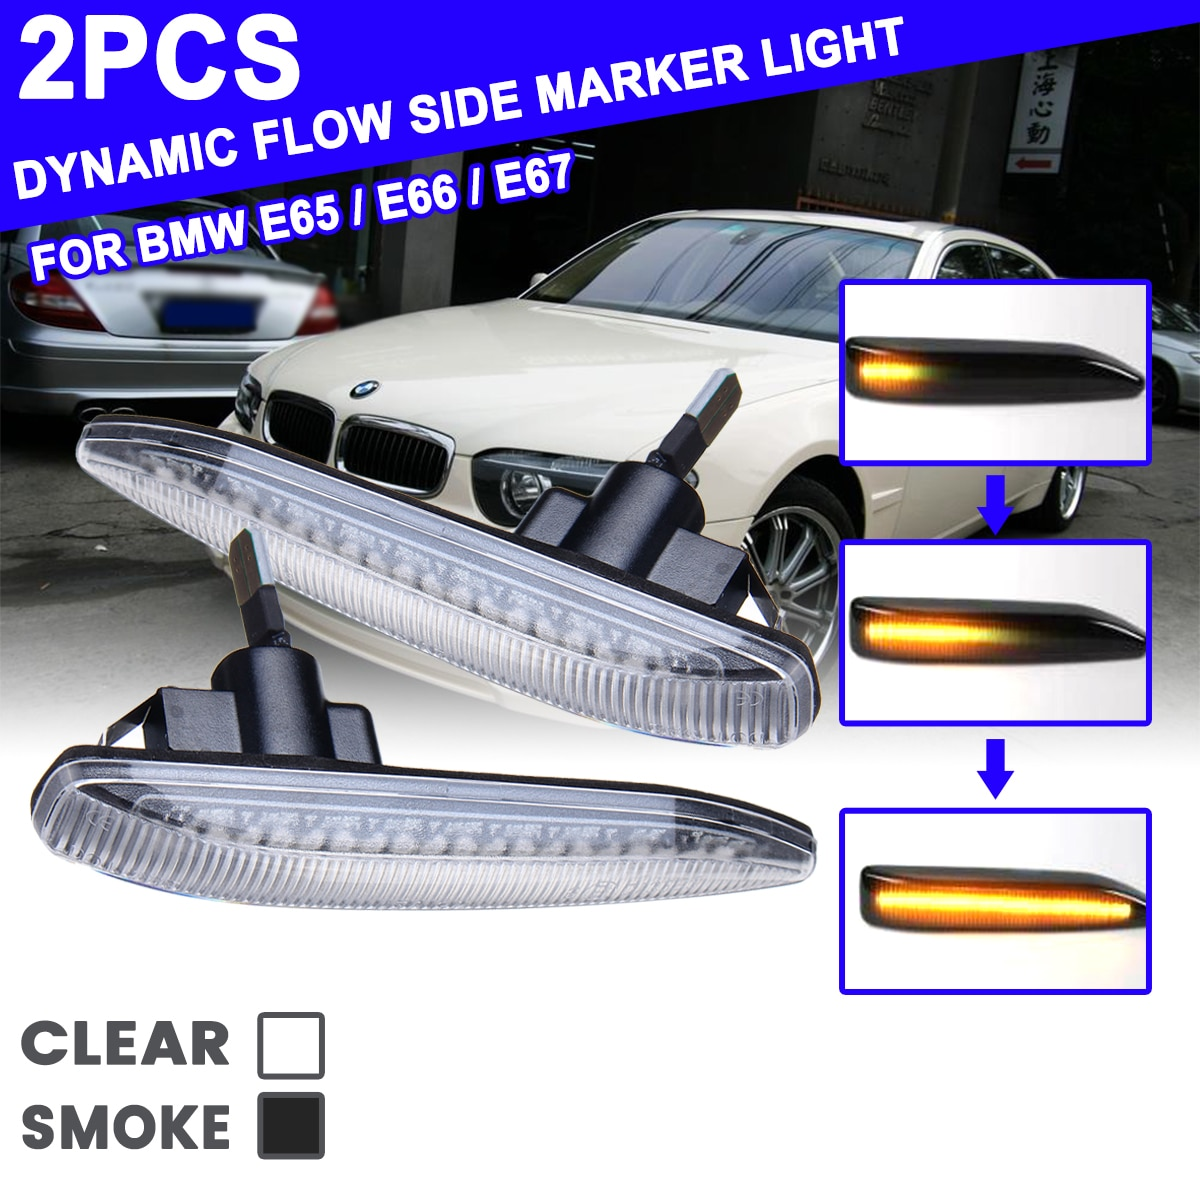 2Pcs for BMW 7 Series E65 E66 E67 E68 Flowing LED Side Marker Lights Dynamic Turn Signal Light Side Repeater Lamp Panel Lamp